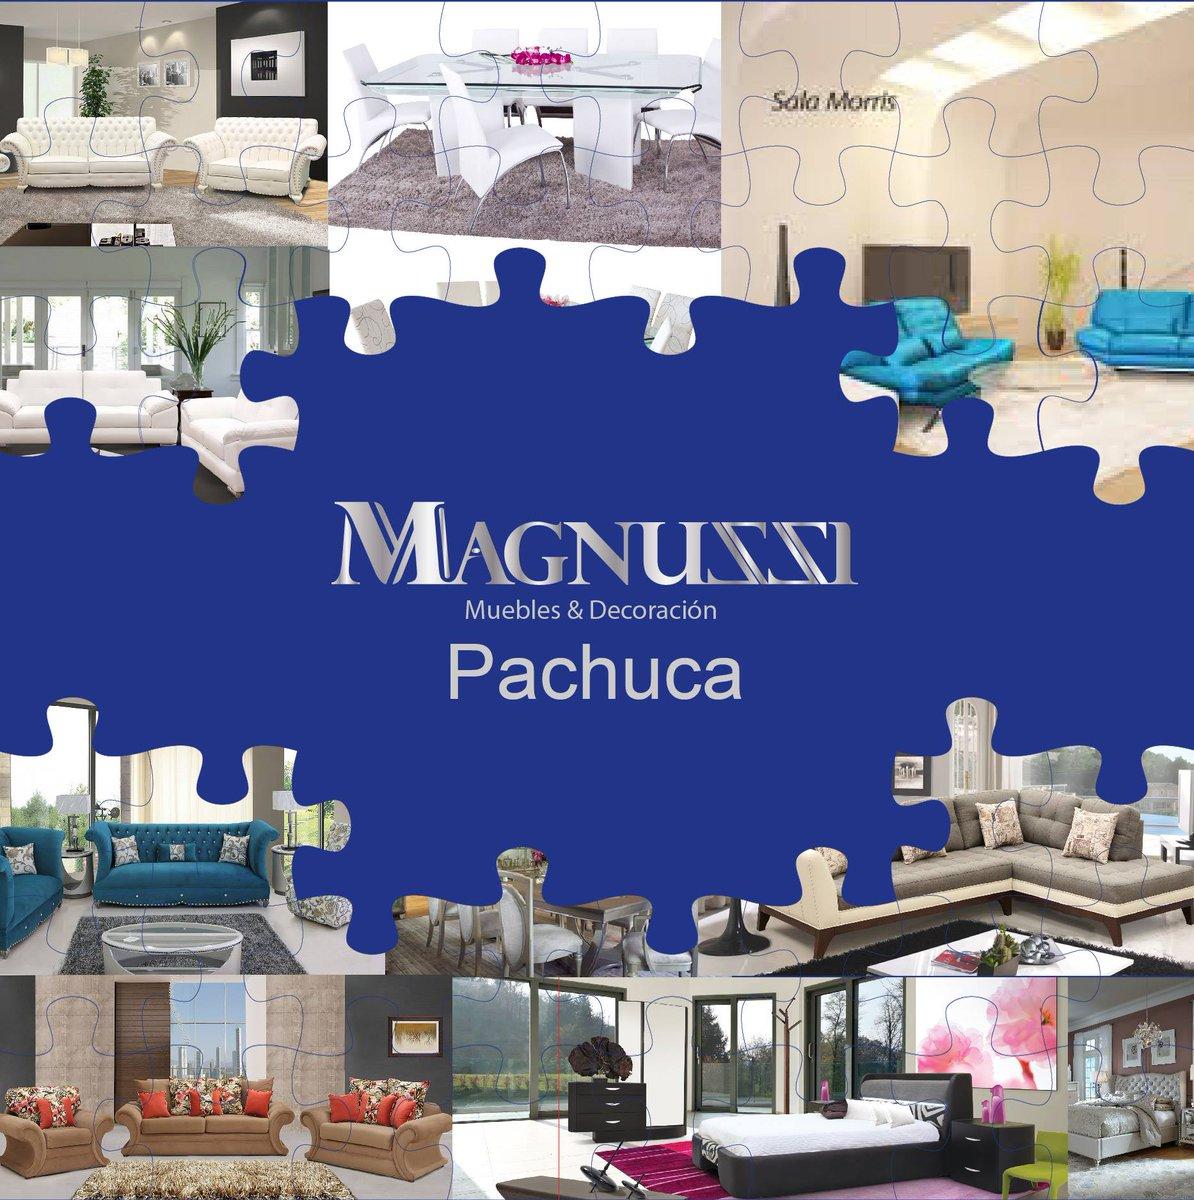 Magnussi Muebles Magnussimuebles Twitter # Muebles Pachuca